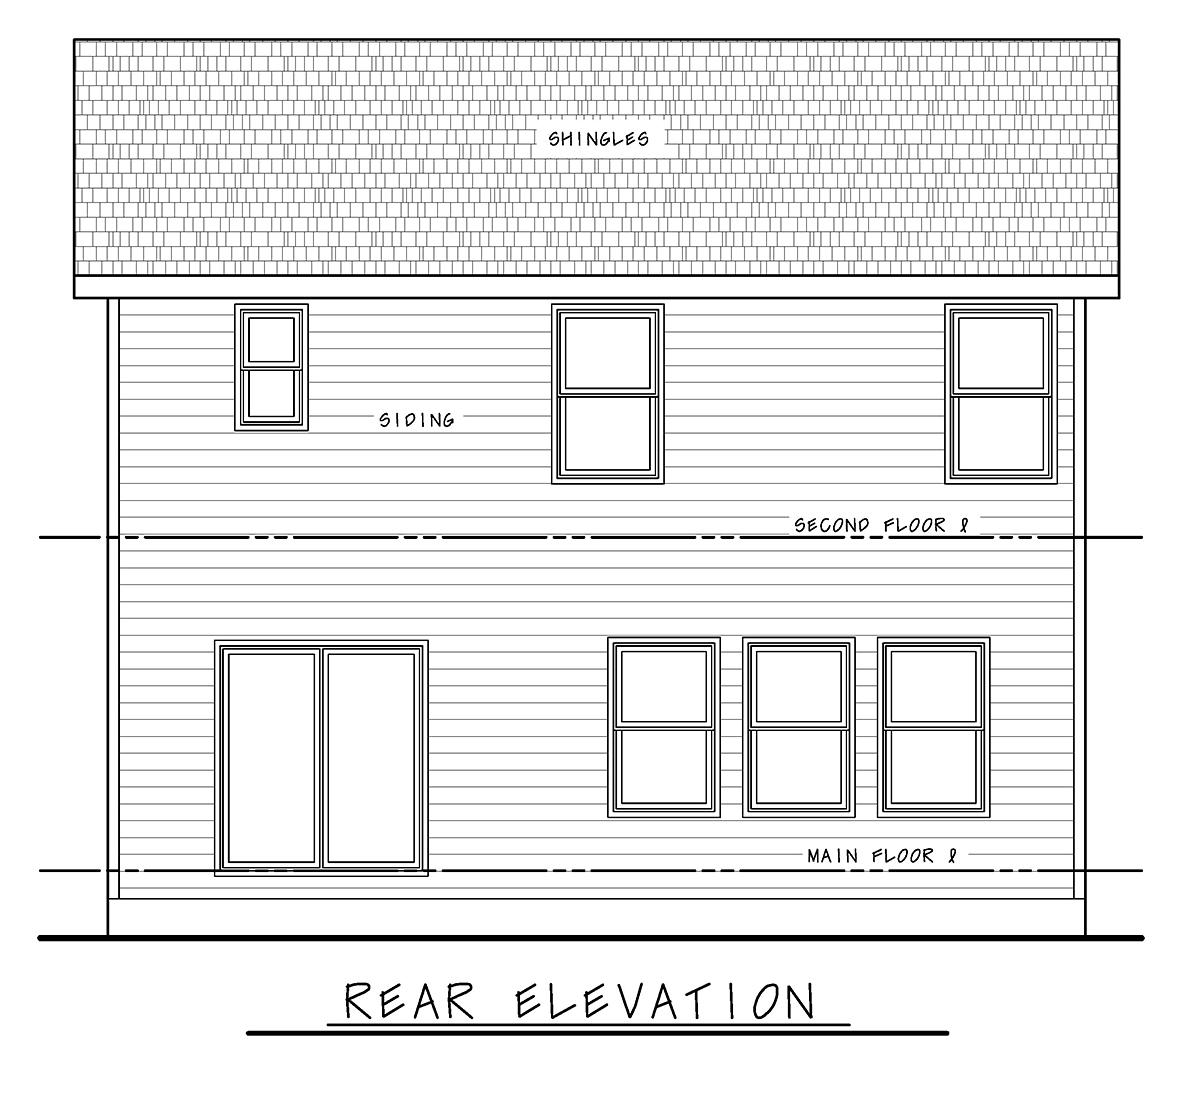 Farmhouse House Plan 75739 with 4 Beds, 3 Baths, 2 Car Garage Rear Elevation